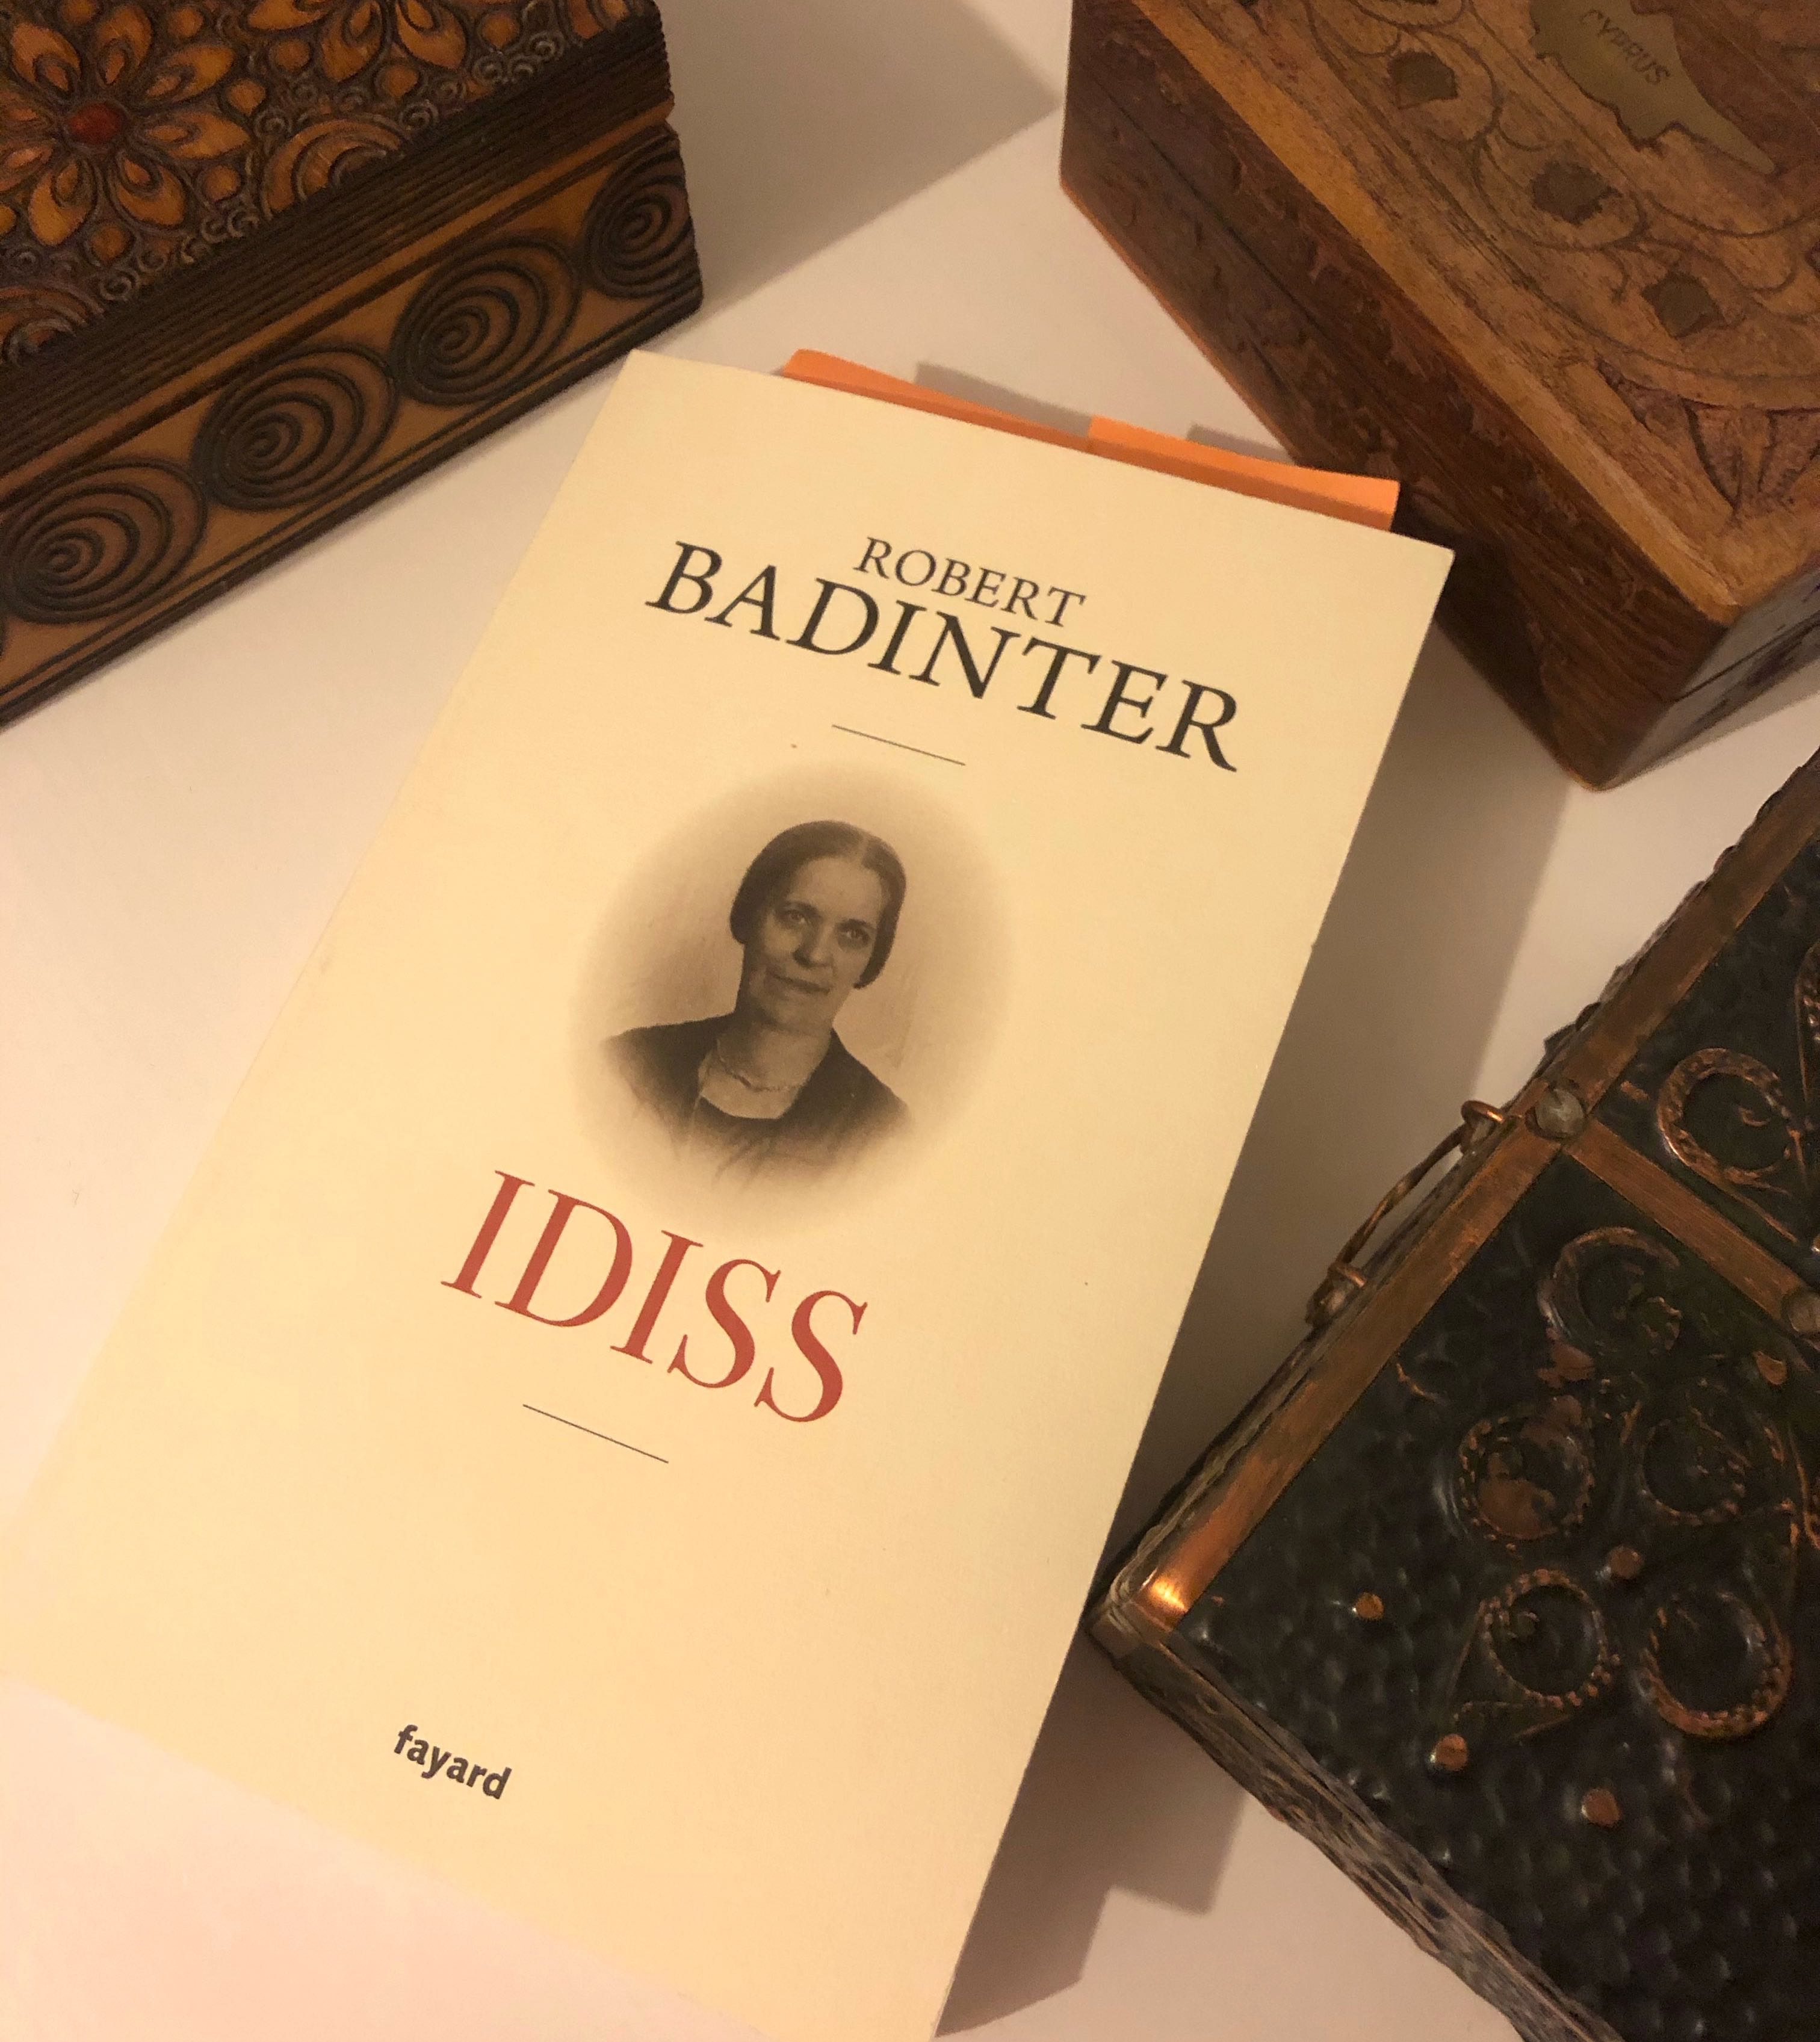 [Lecture] Idiss, de Robert Badinter